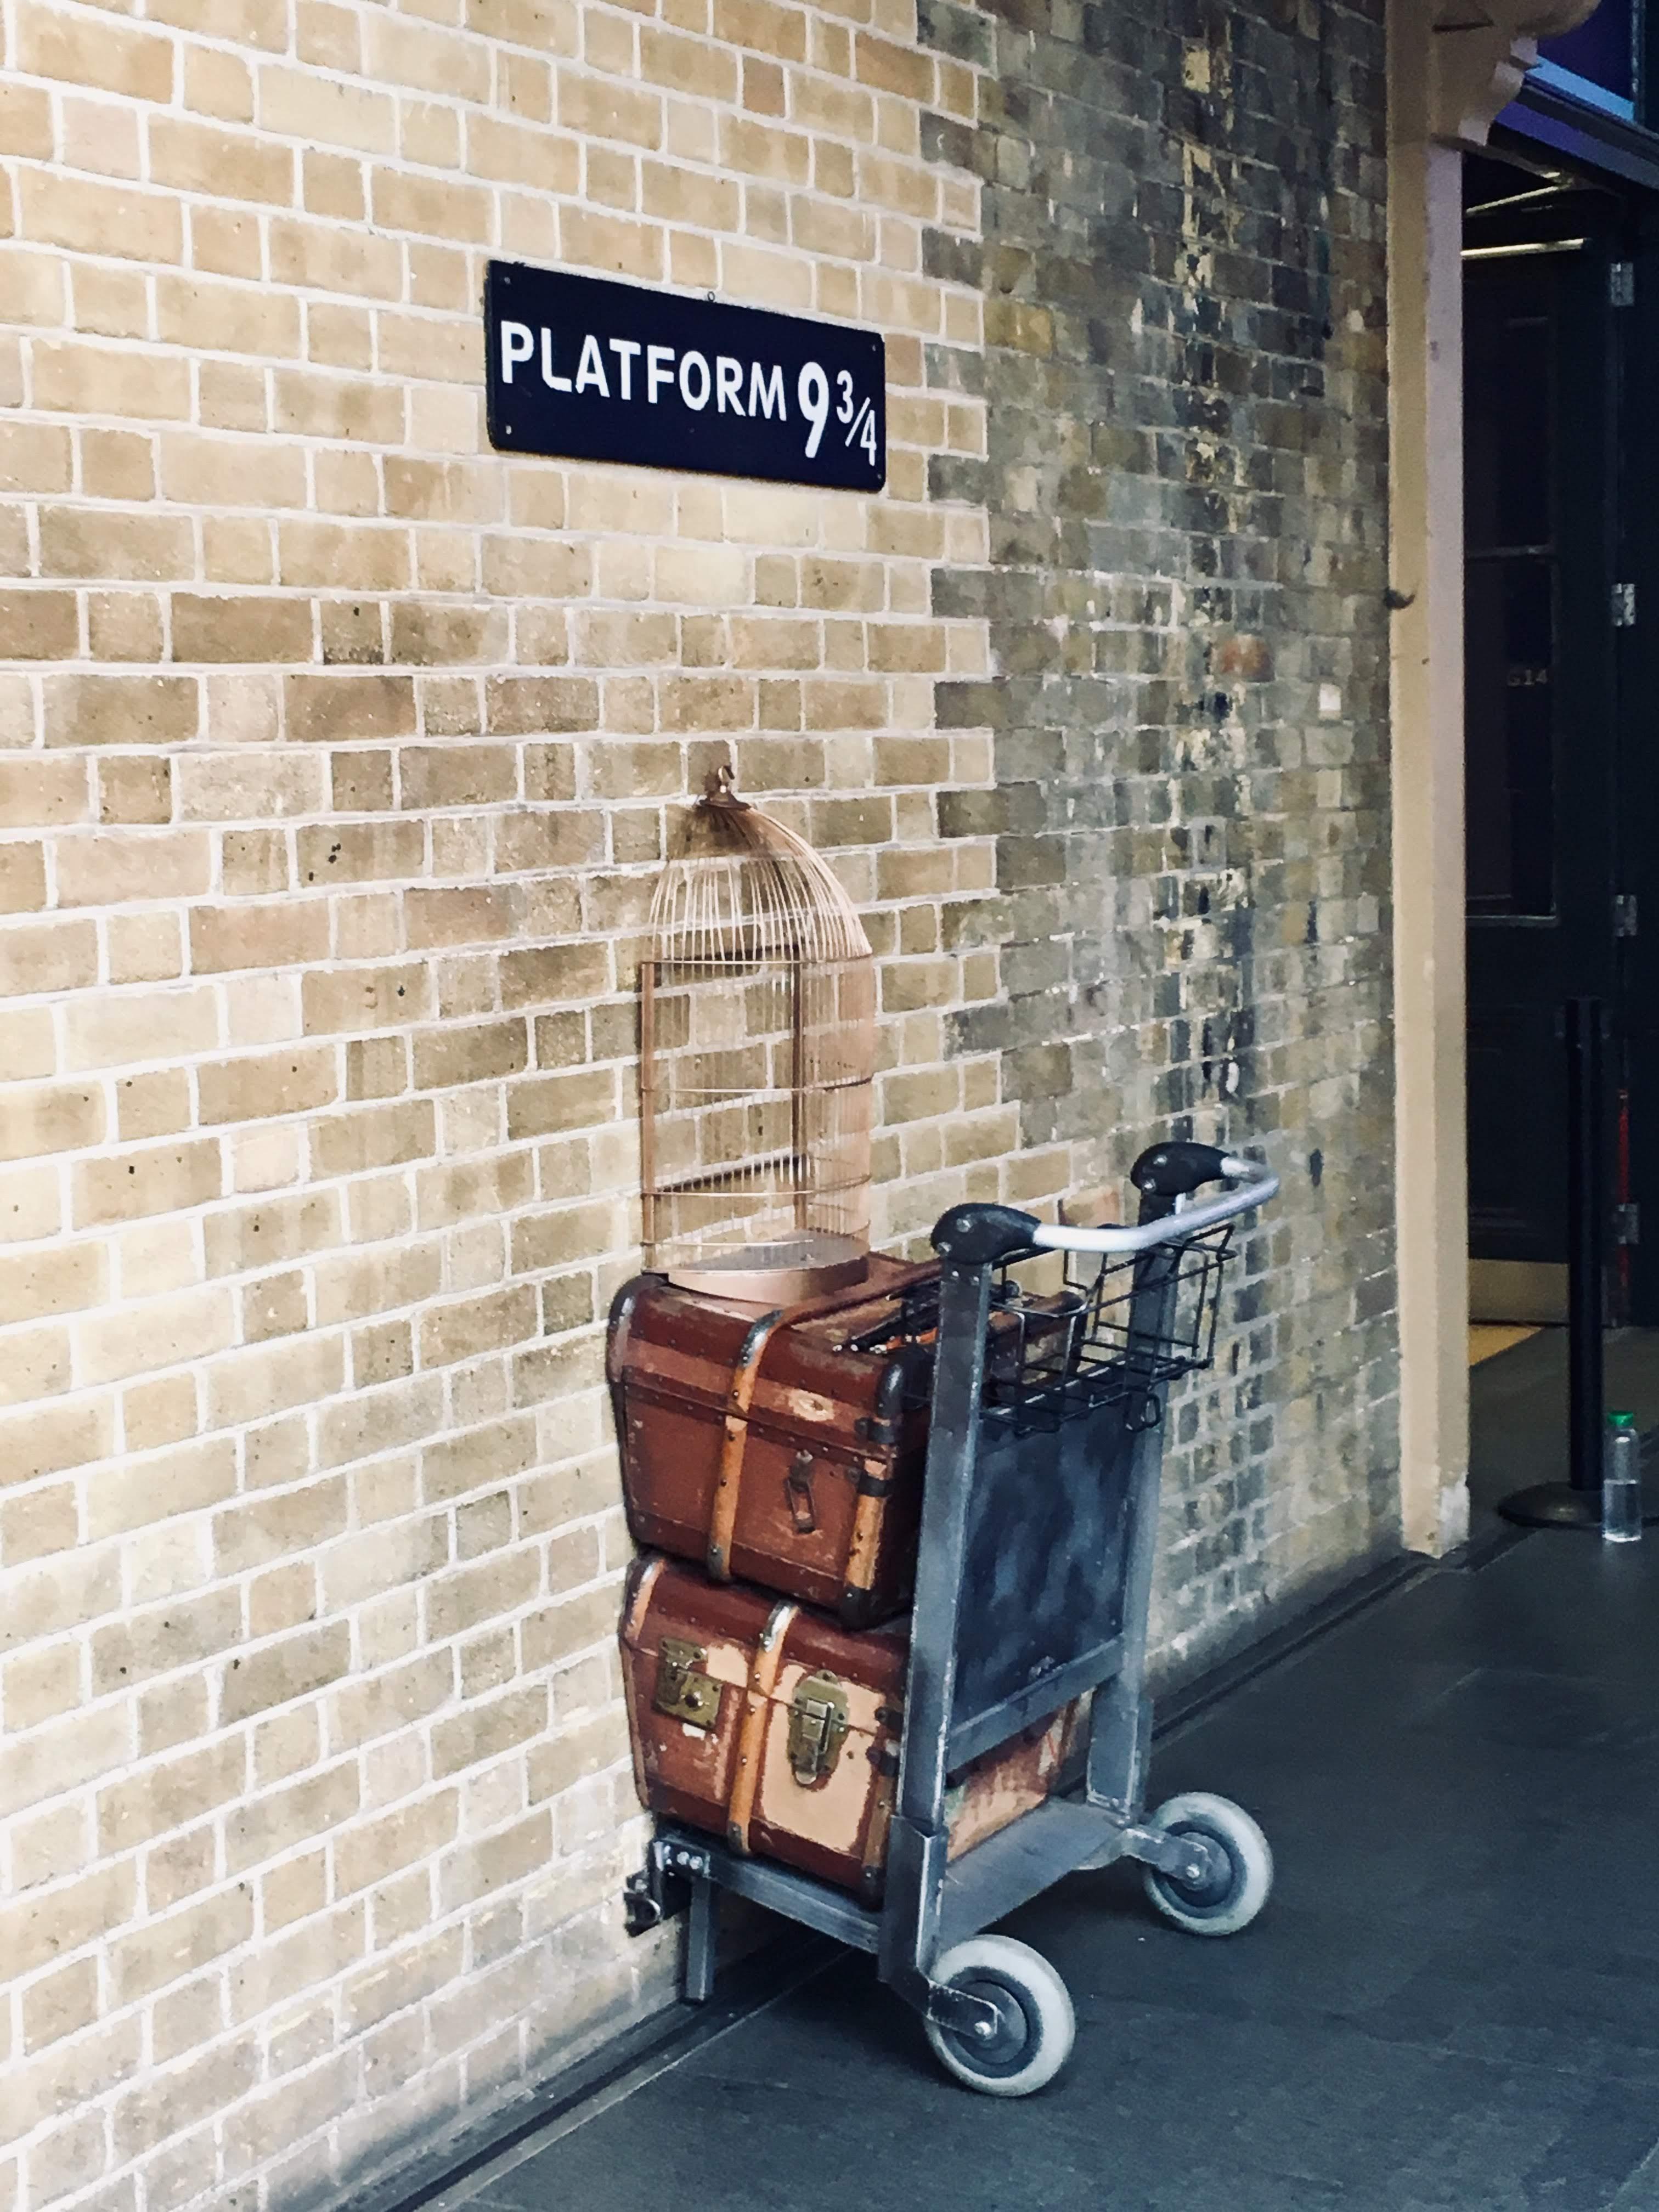 Platform 9 3/4 at Kings Cross Station in London